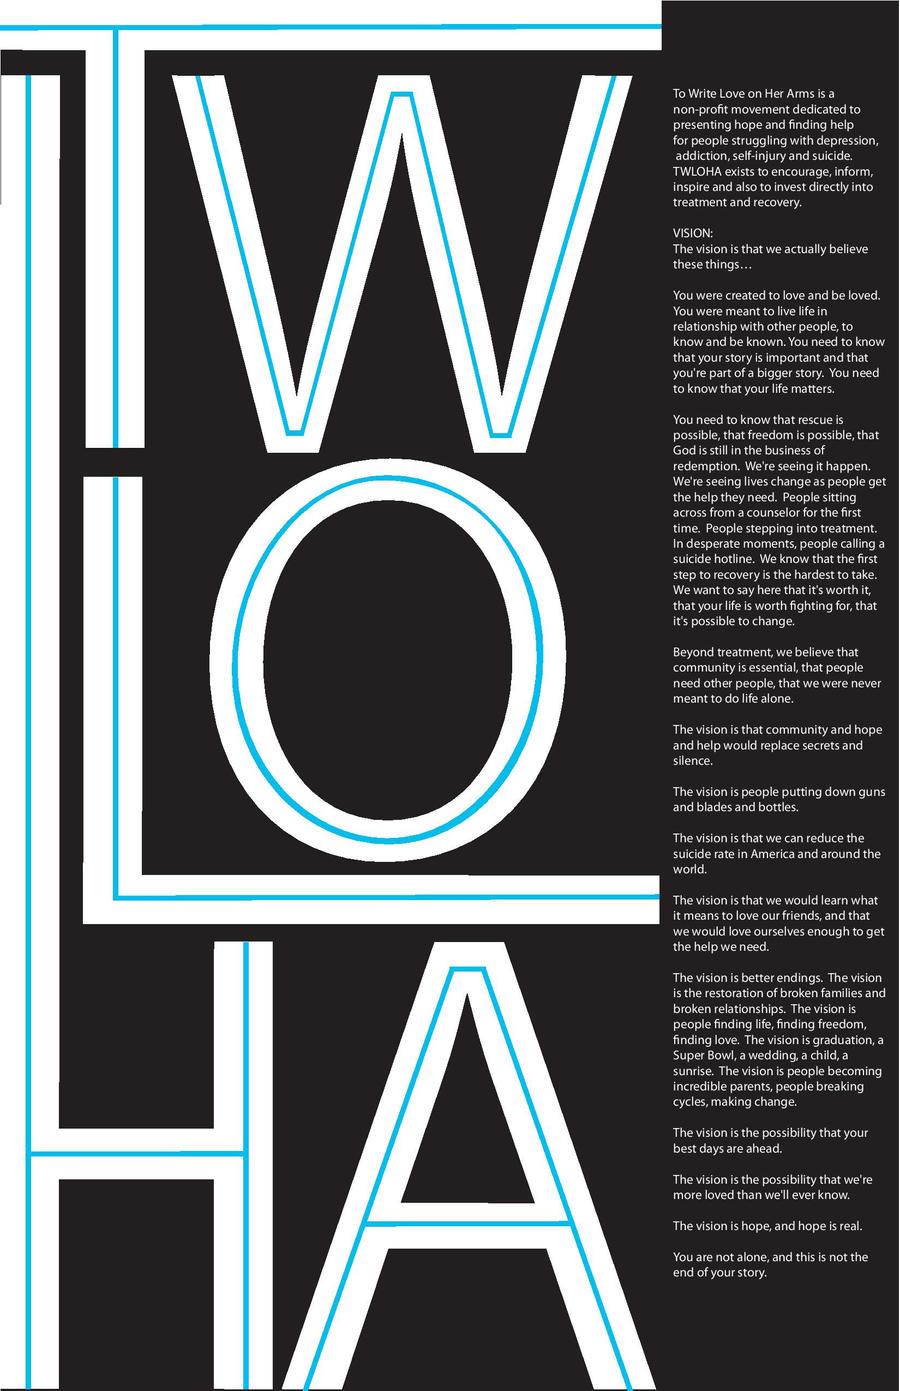 TWLOHA Promotional Poster